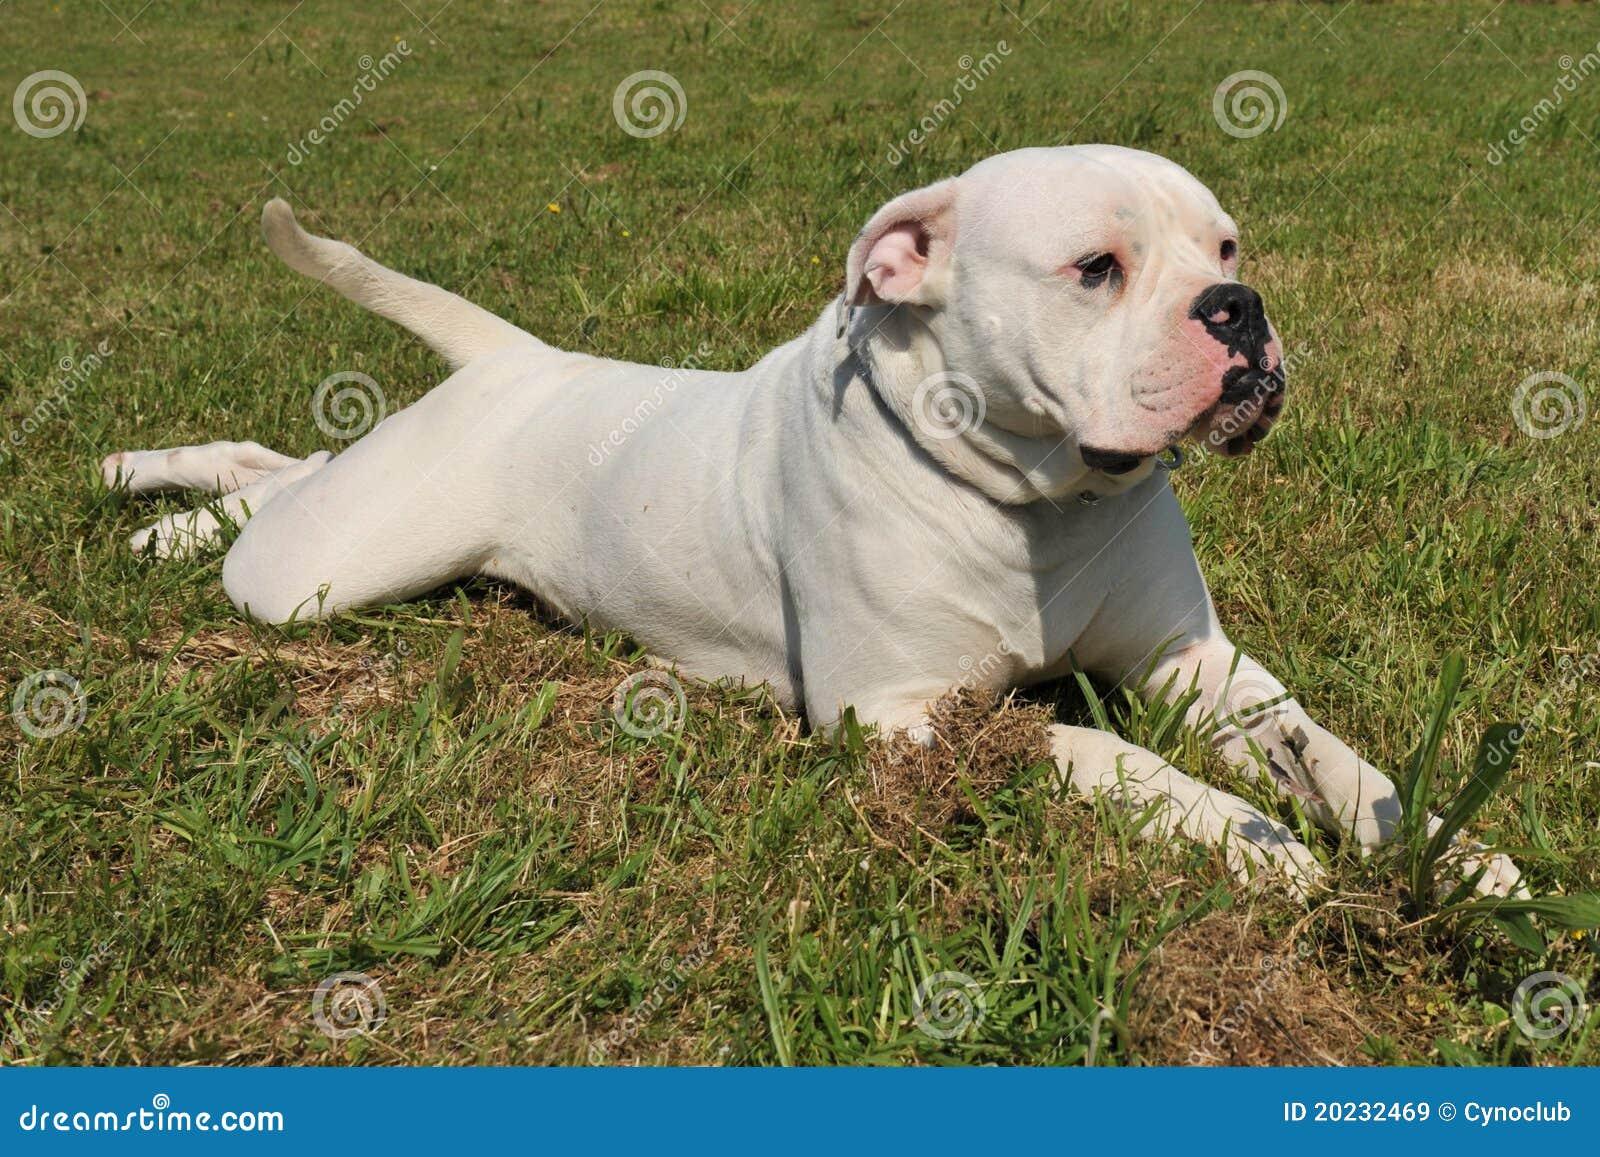 American Bulldog Stock Image Image Of Lying Argentinian